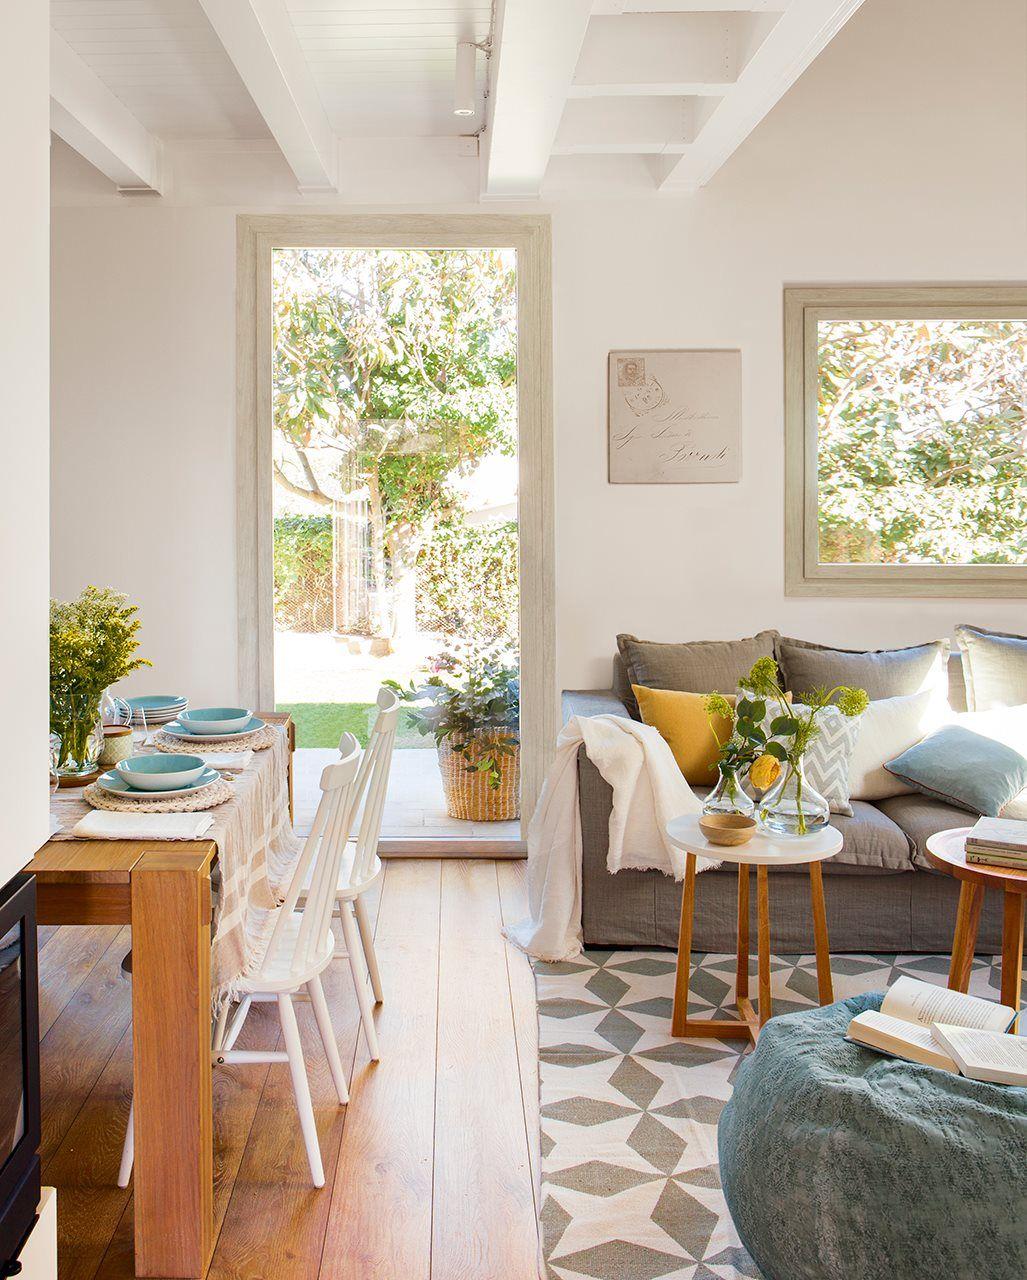 Sal n comedor con vistas al jard n living rooms salons and room - El mercader de venecia muebles outlet ...